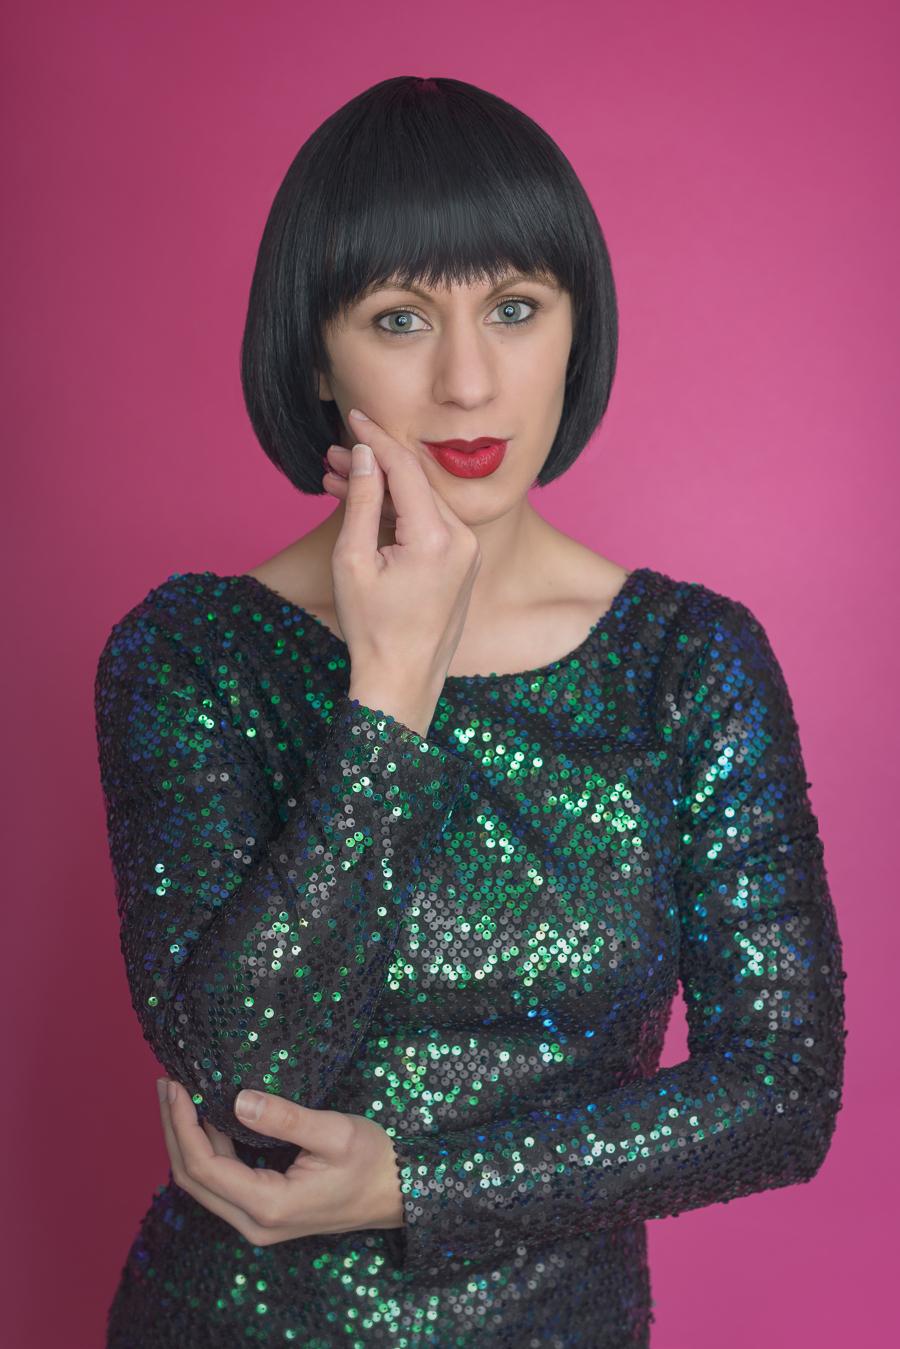 Sparkle sparkle / Photography by tonybp, Model Freya, Makeup by Freya, Stylist Freya / Uploaded 30th December 2017 @ 10:38 AM